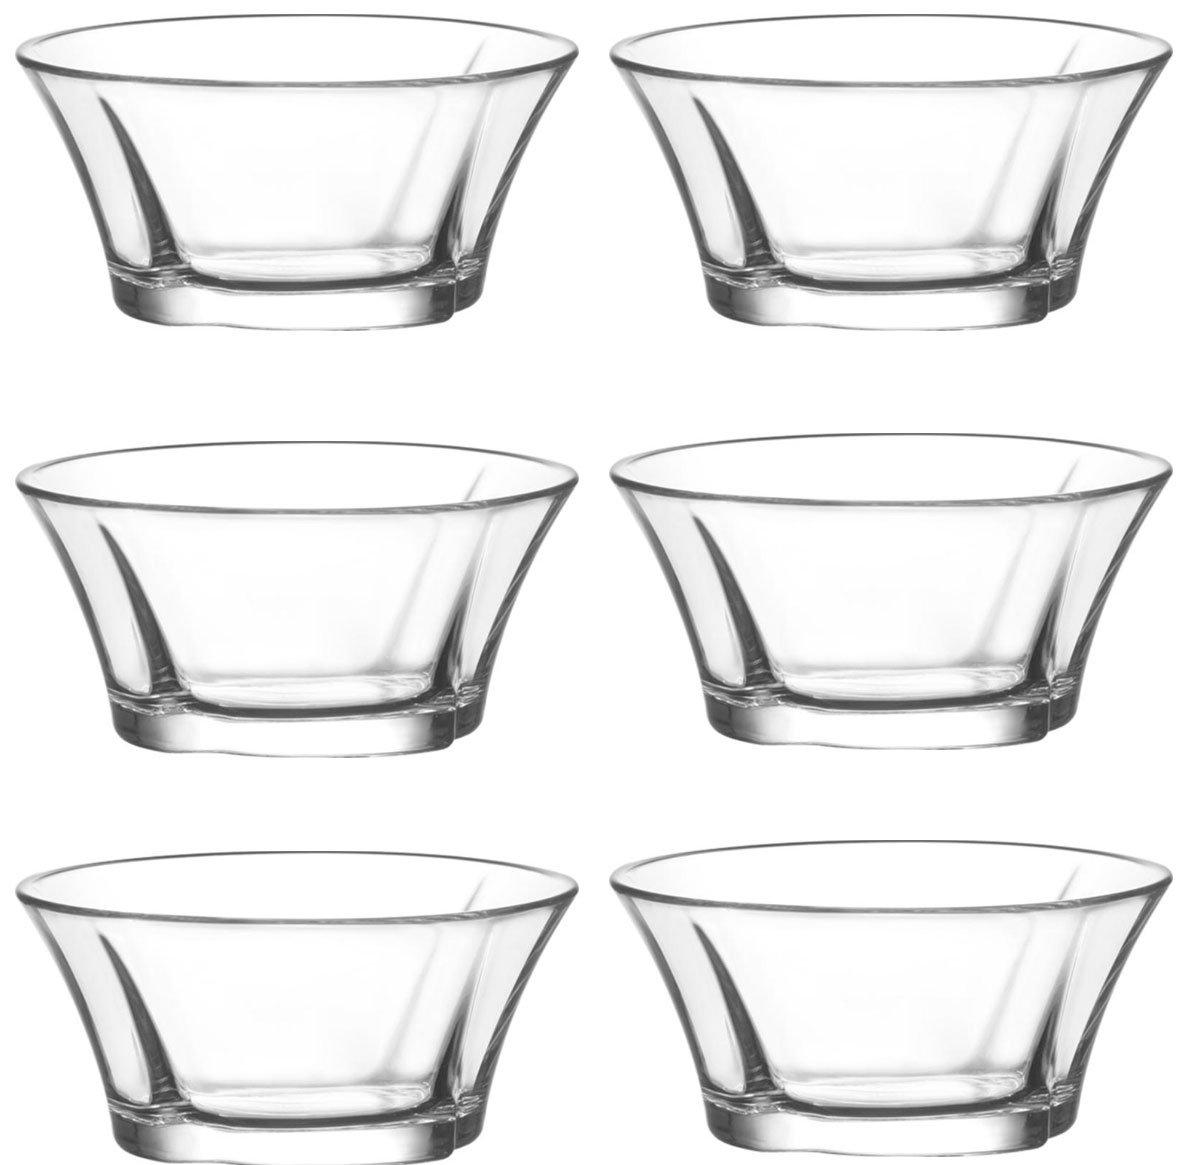 Lav 6/Christbaumkugeln-24 r/ígida Truva cuencos cristal Carcasa/ /Cuenco de postre vorspeise Cristal Vasos 190/ml